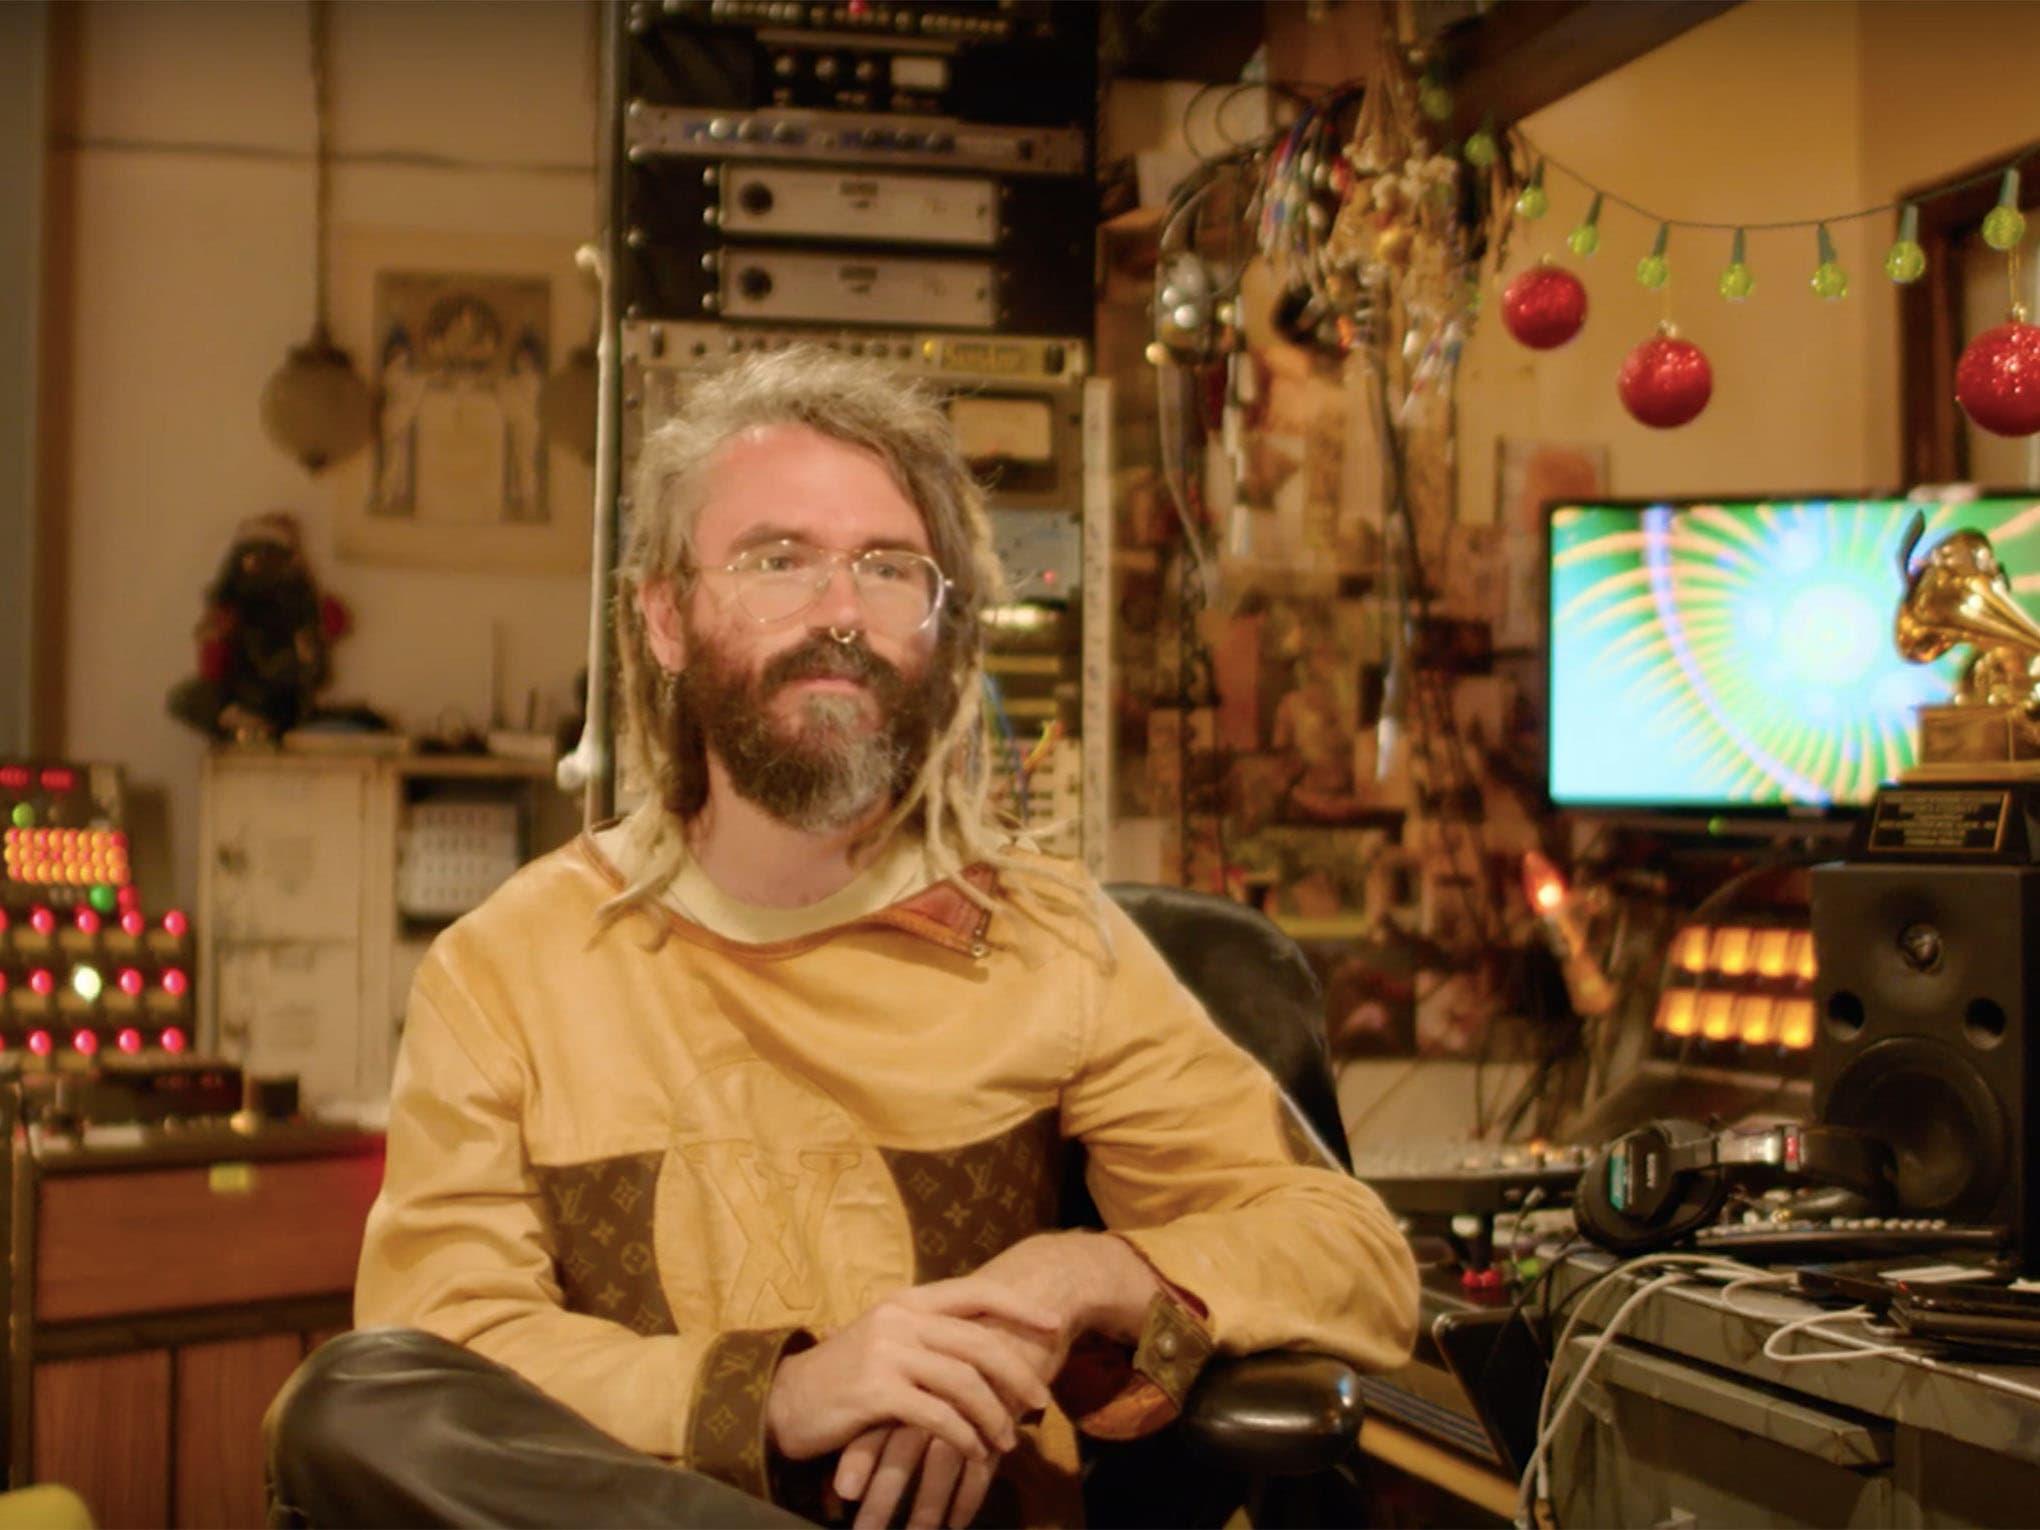 Bearded man in sweatshirt sitting in studio with Grammy award next to him